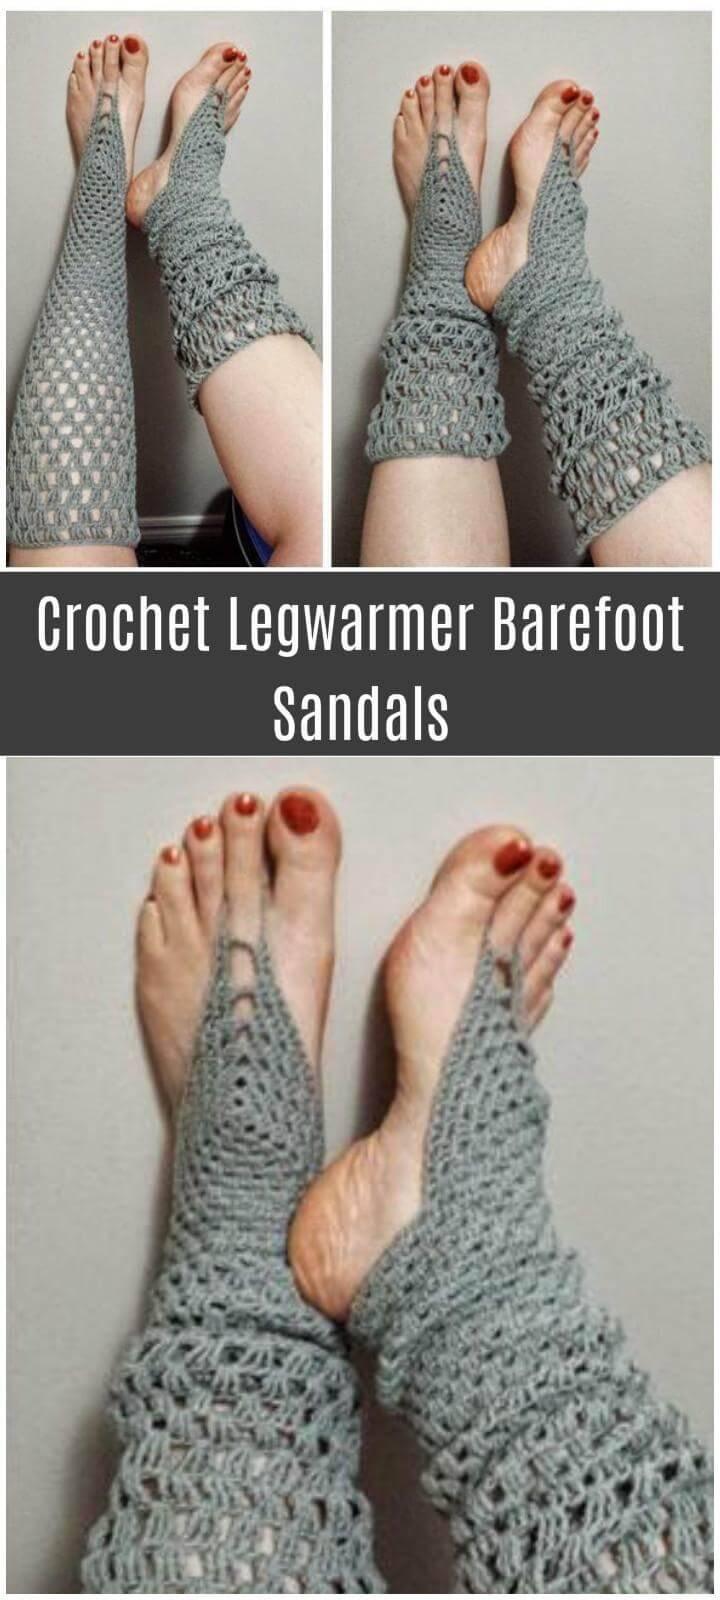 Crochet Legwarmer Barefoot Sandals Free Pattern